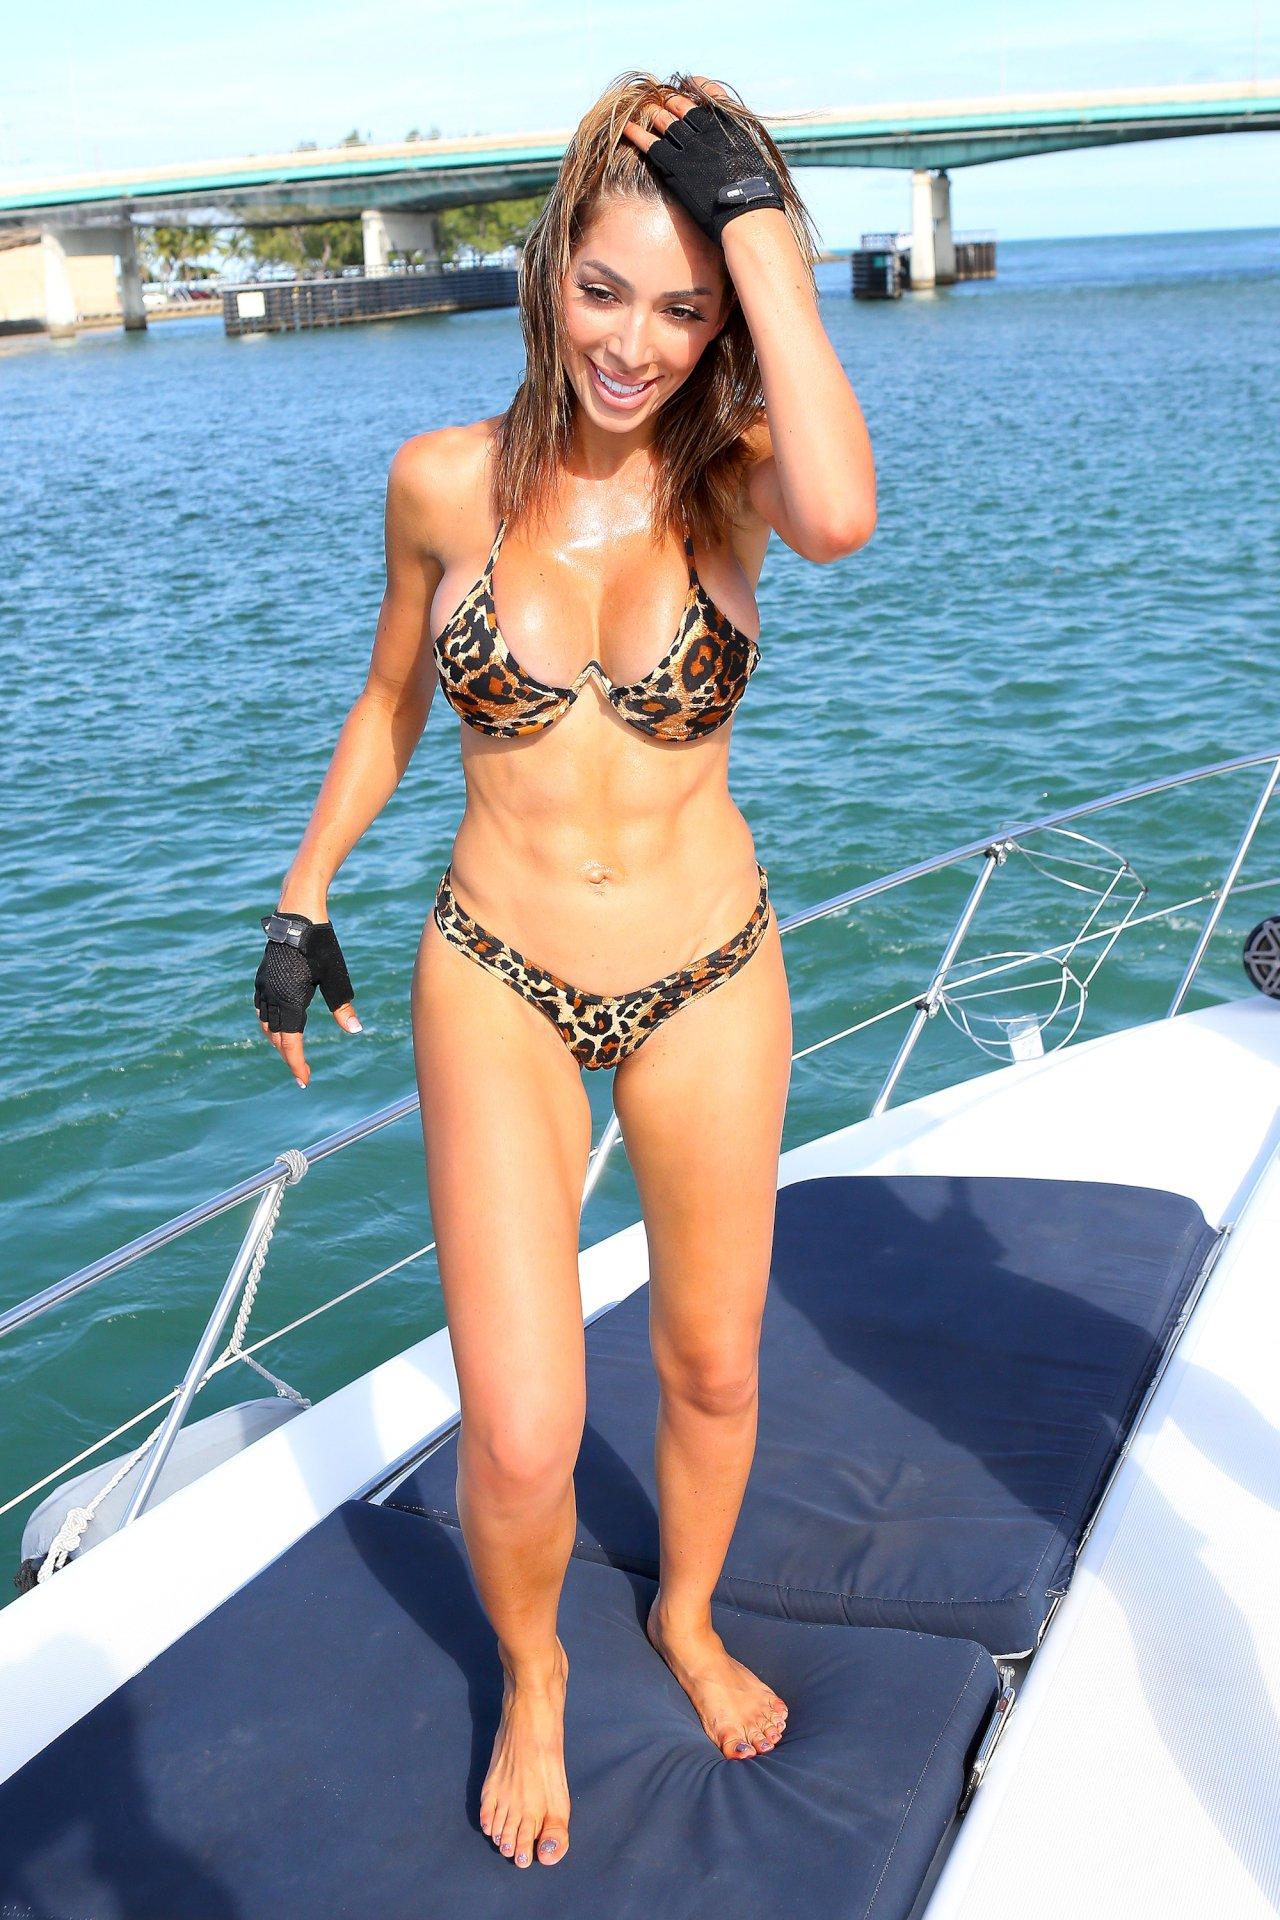 Emma watson nude celeb pics,REDDIT Adriana Sephora Erotic gallery Rachael gouvignon 6785,Justin Bieber Sexy Shirtless Pic